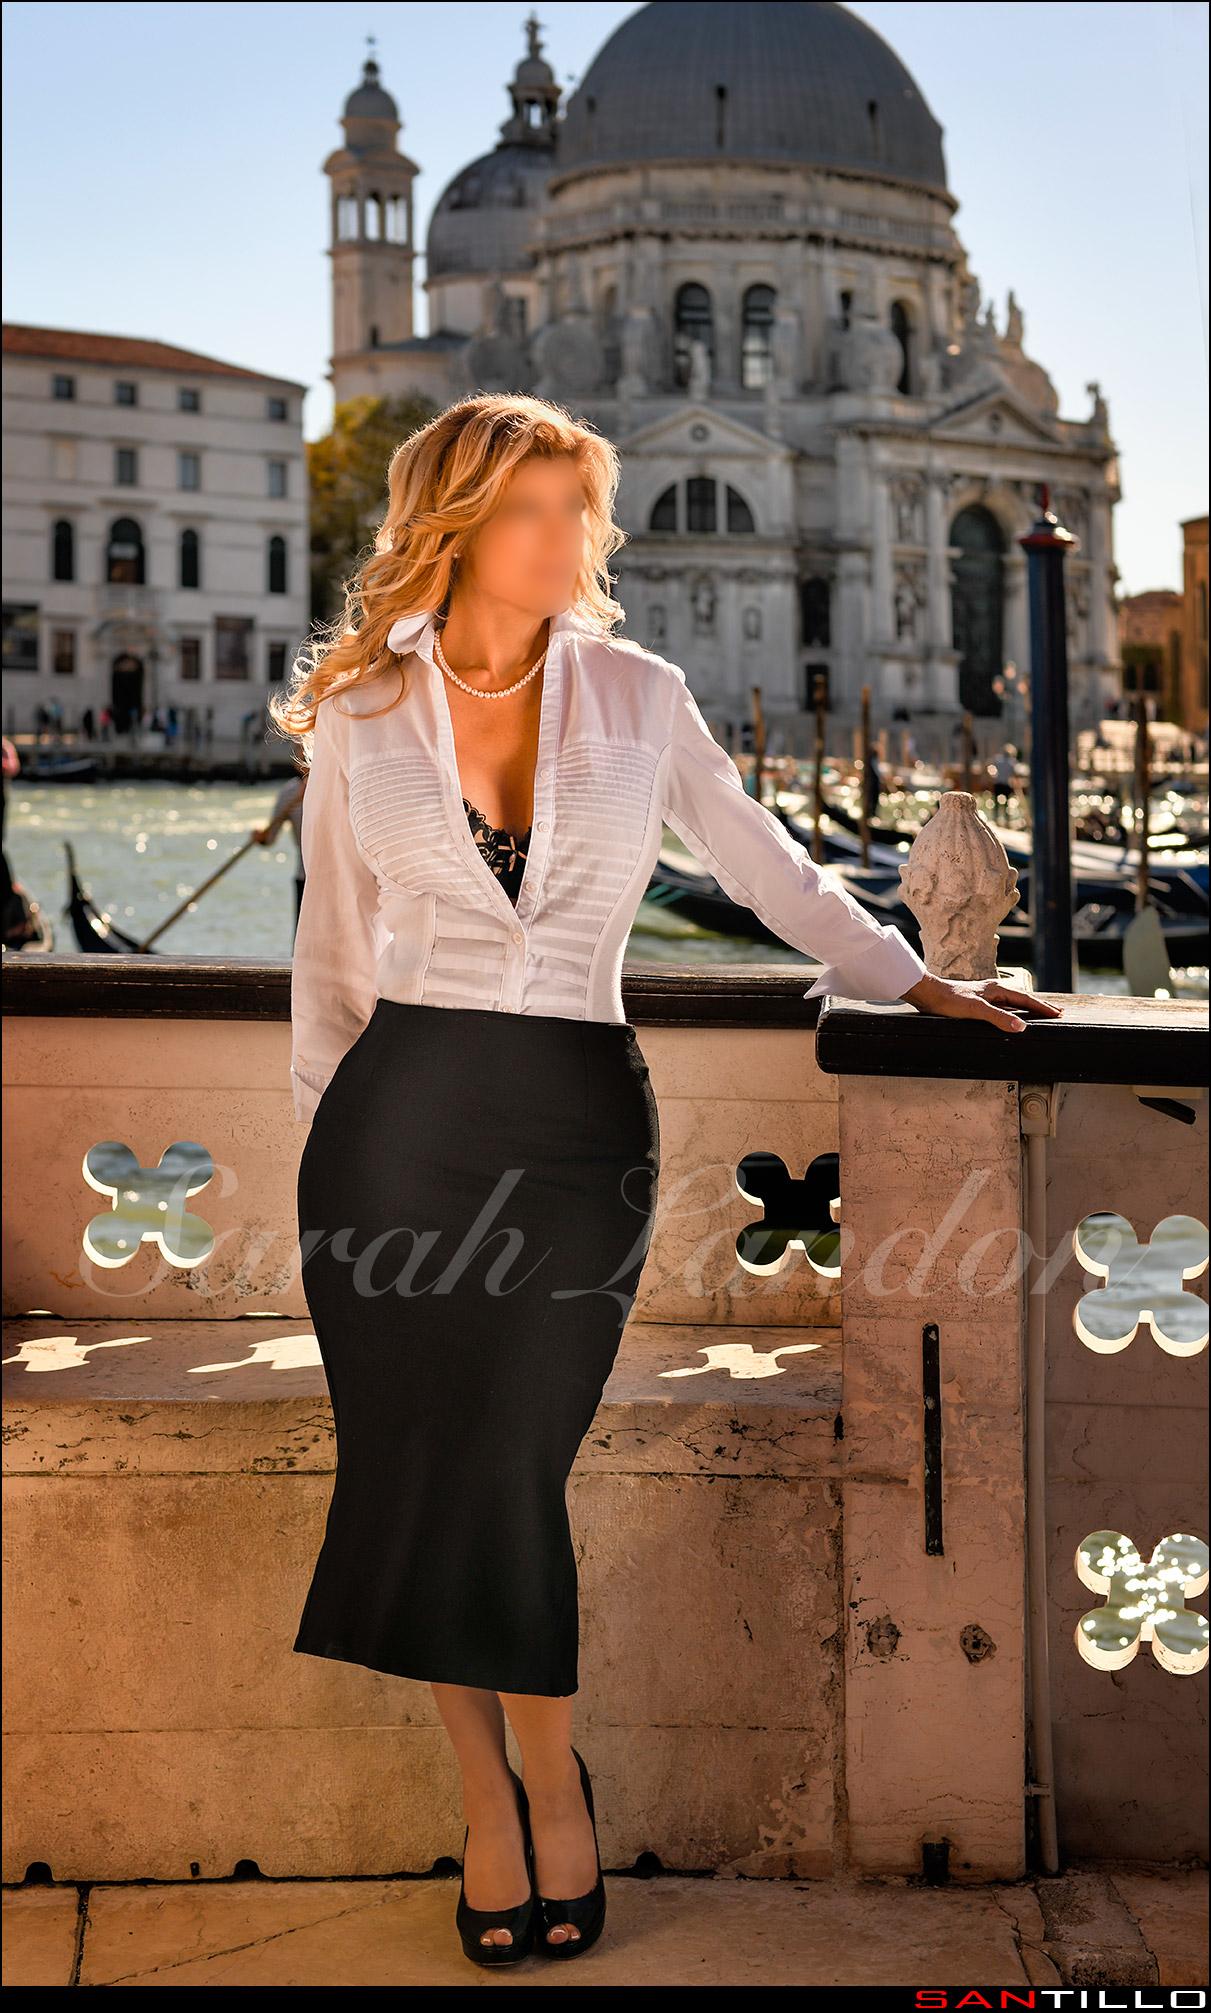 Sarah Landon VIP Companion